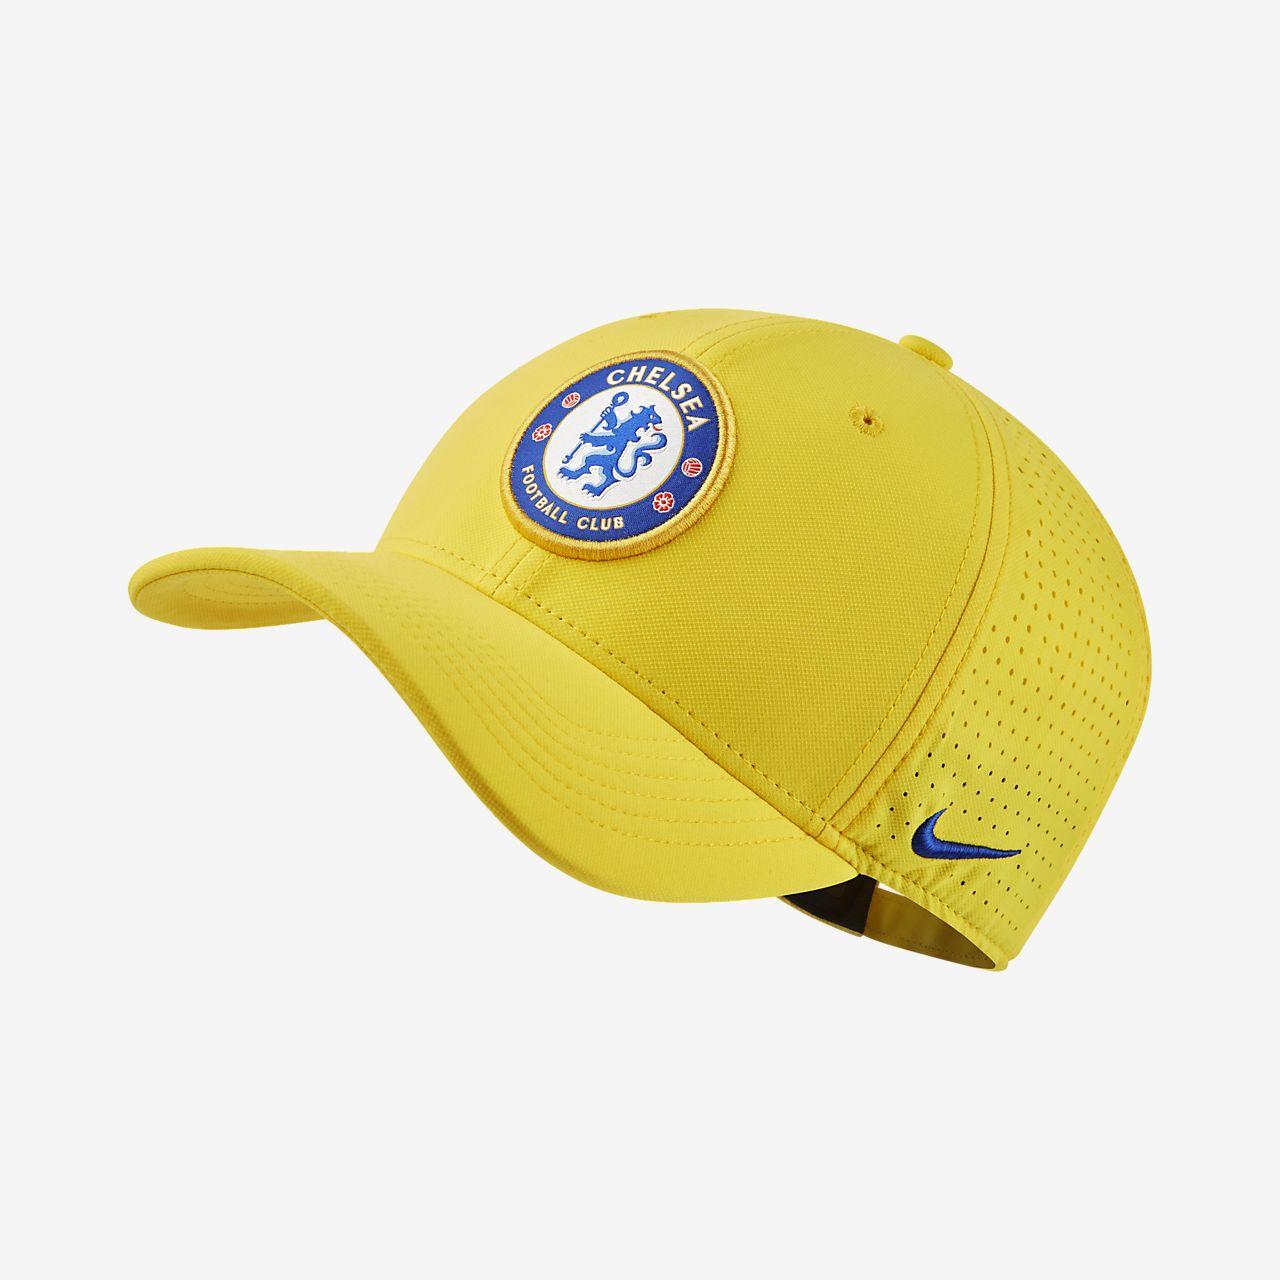 2240d9e70c2 Chelsea FC Aerobill Classic99 verstellbare Cap. Nike.com AT